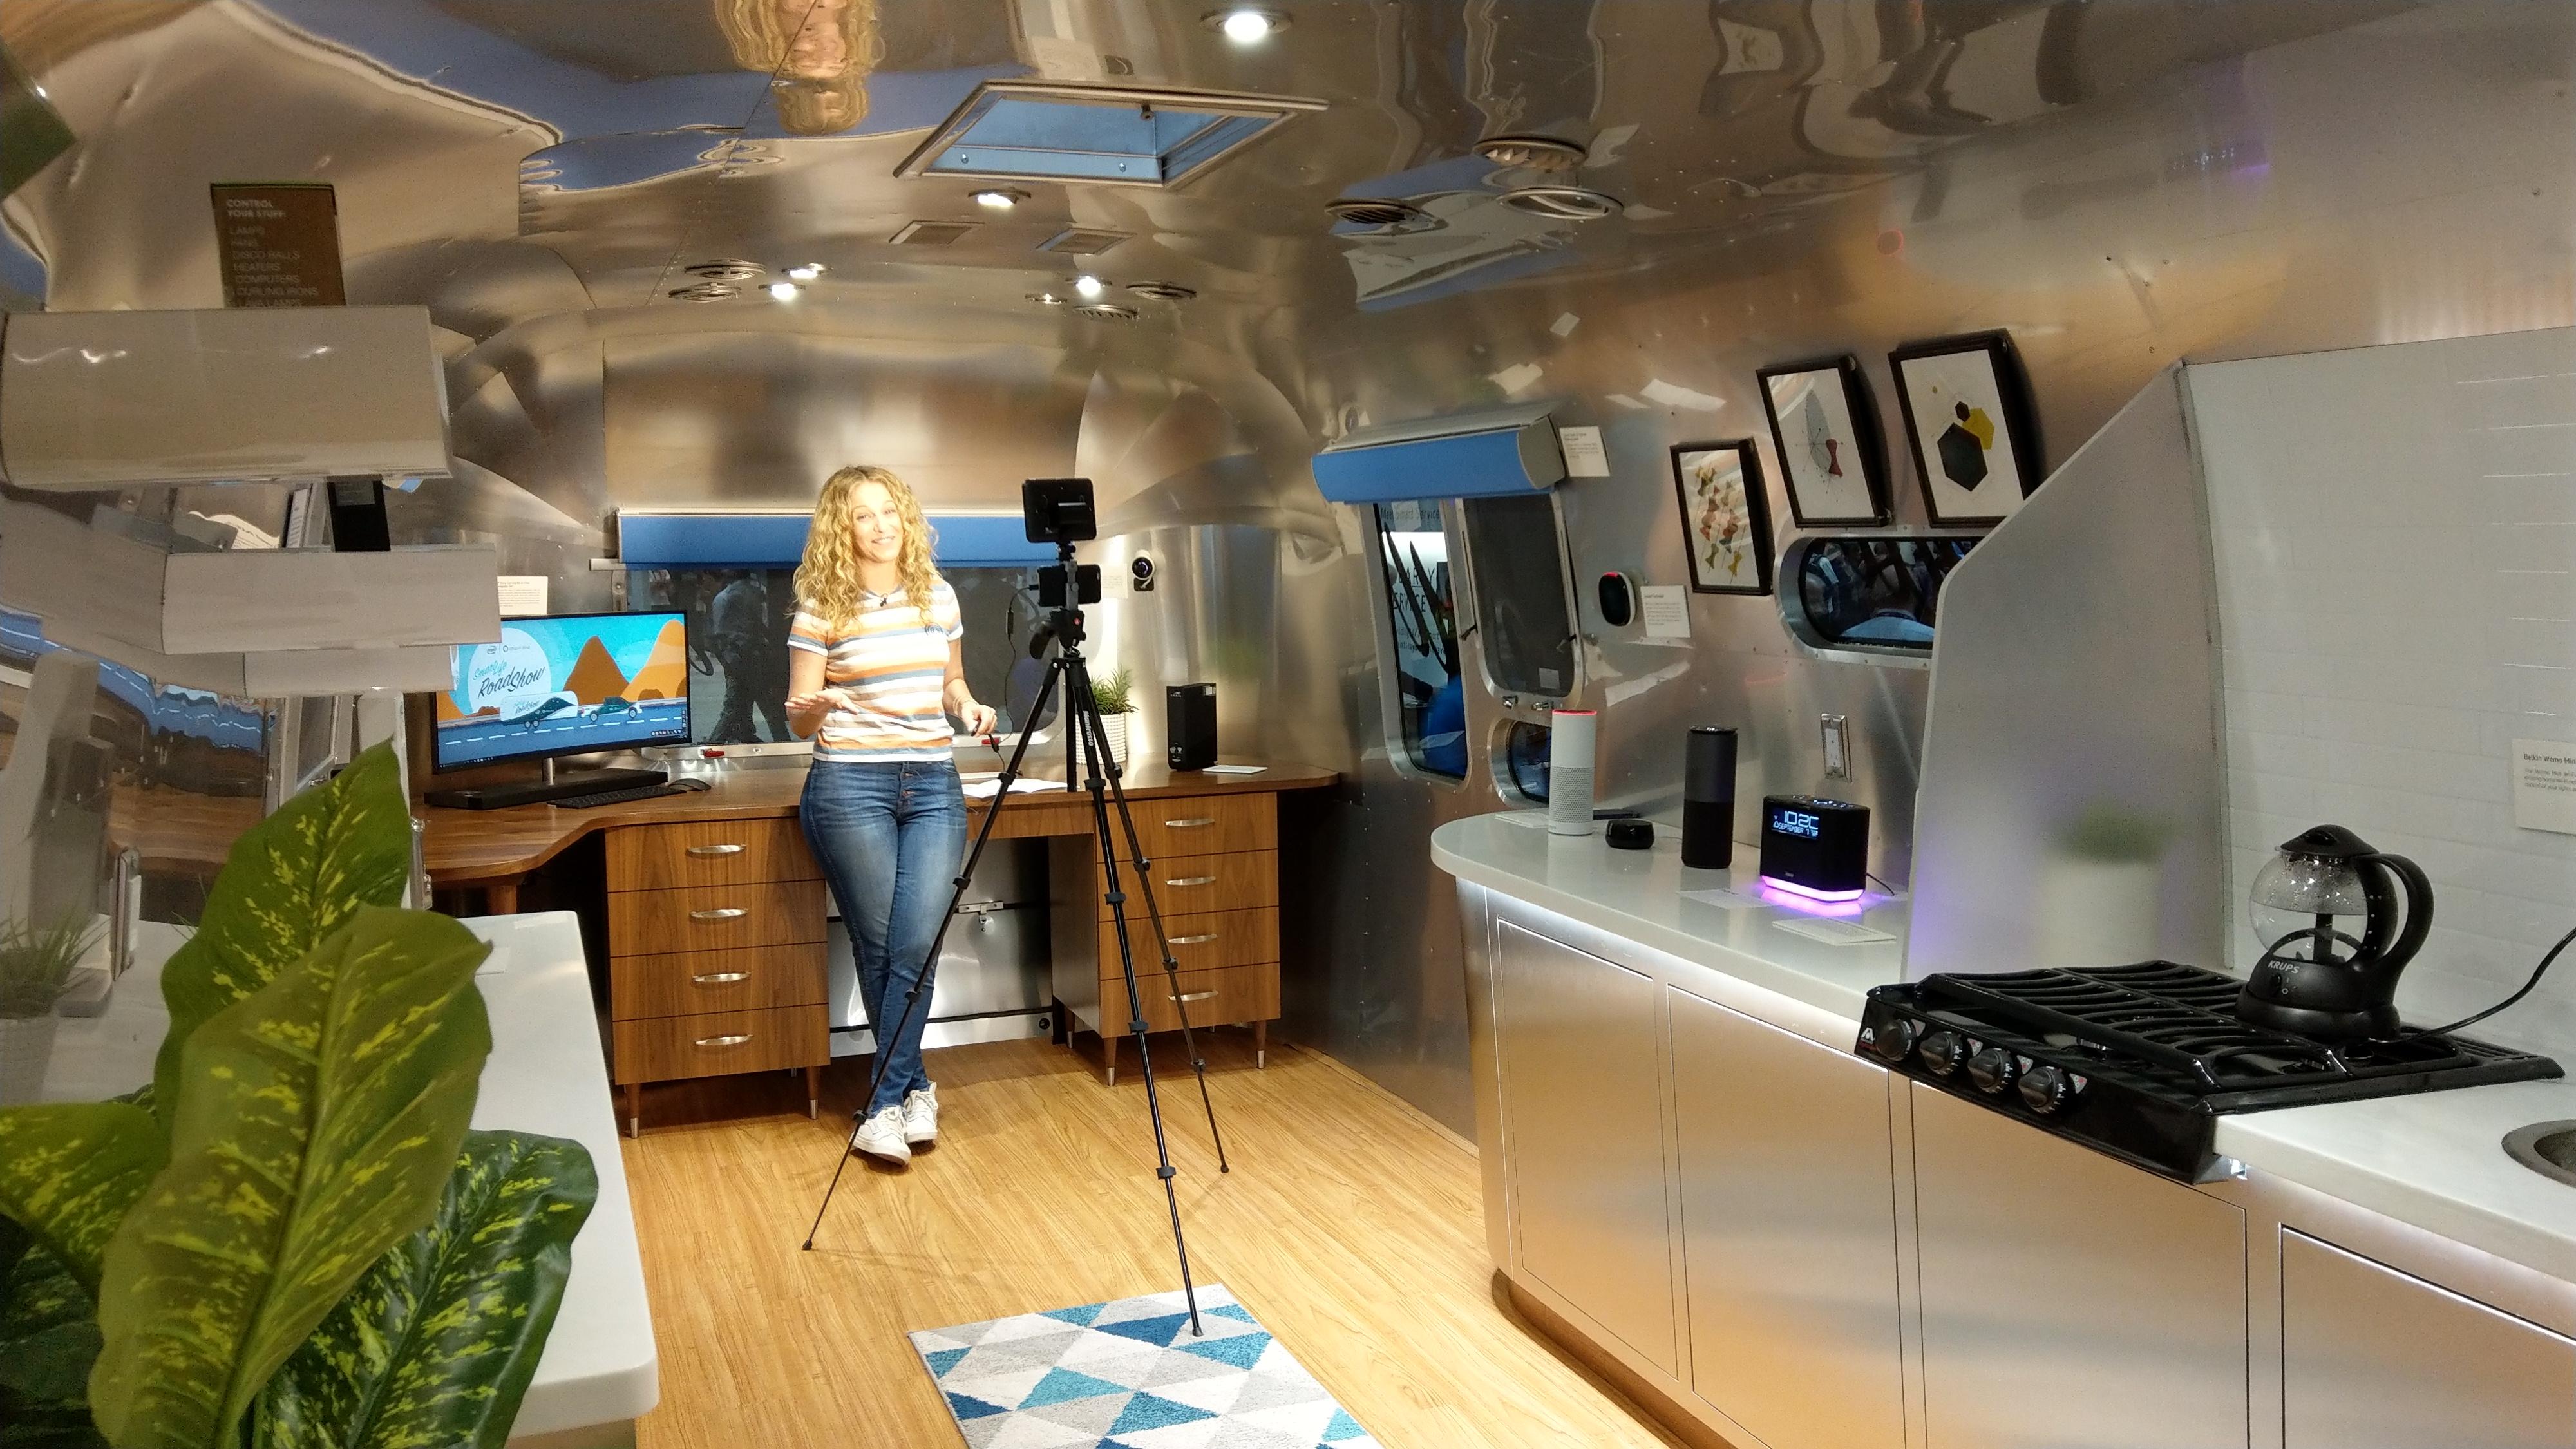 O futuro das receitas  Guru Carley Knobloch no Smarth Home Roadshow Amazon San Diego 2017 - O futuro das receitas